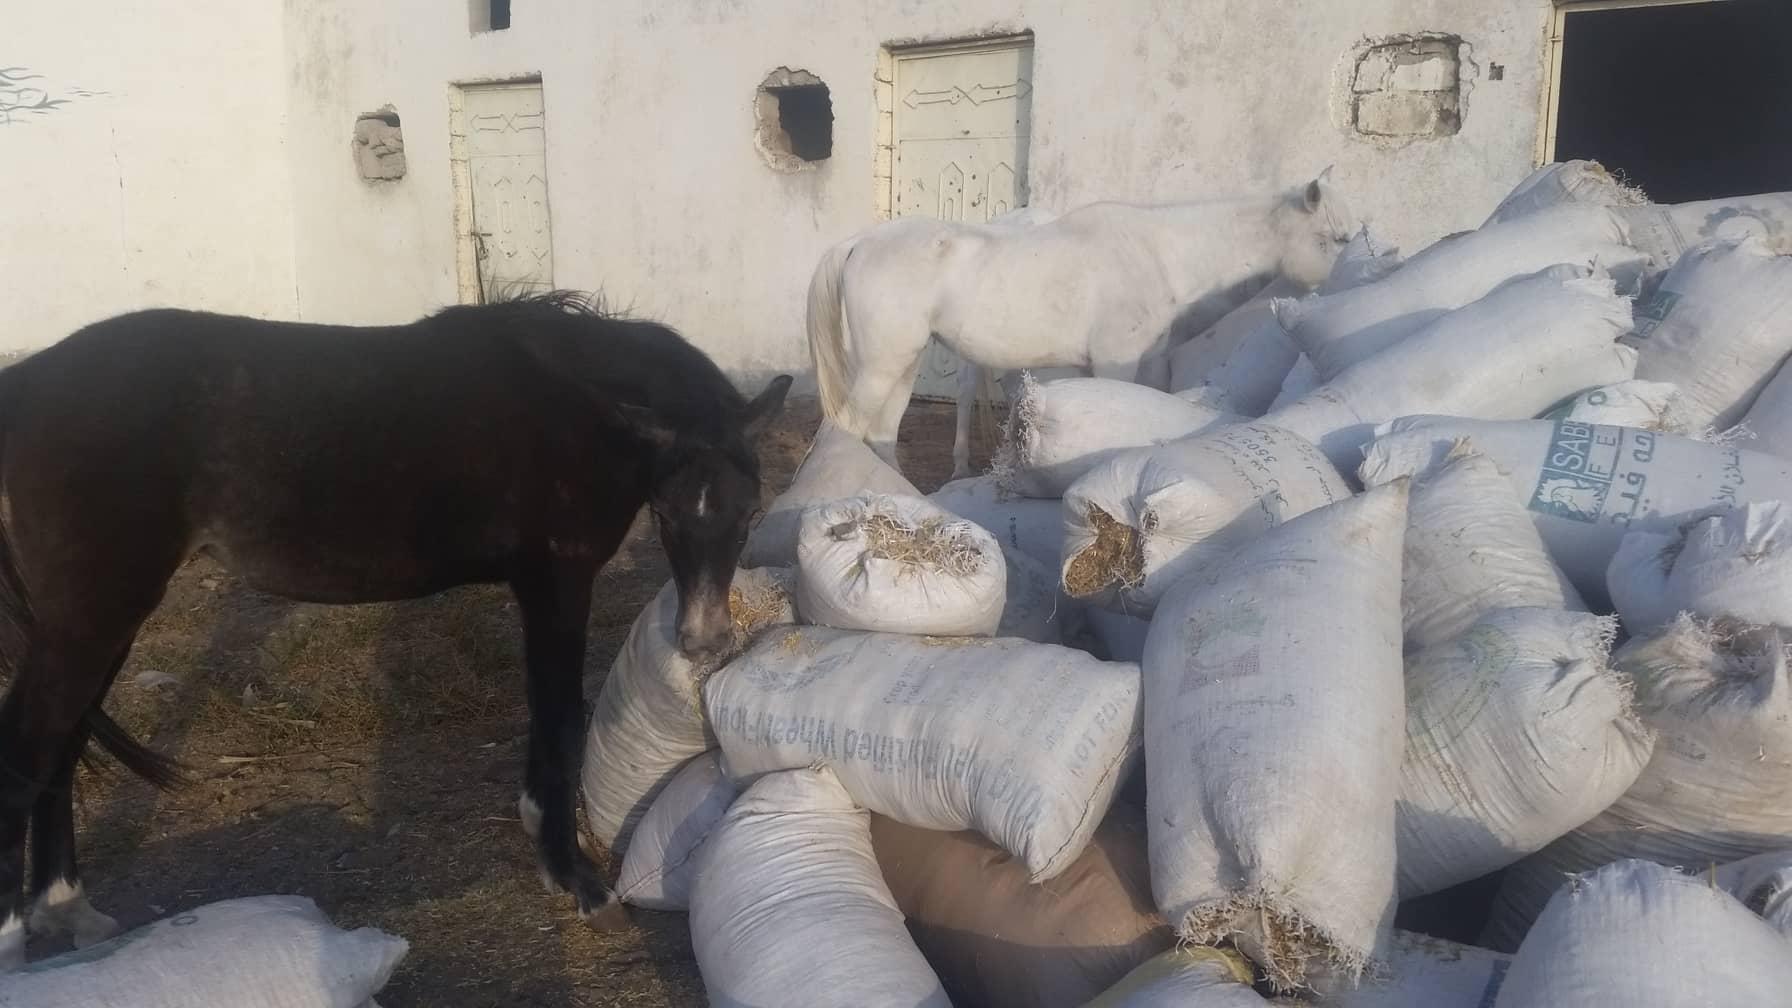 QRAB rescue dhamar 16 hungry horses DEC 2018 by OWAP-AR.jpg